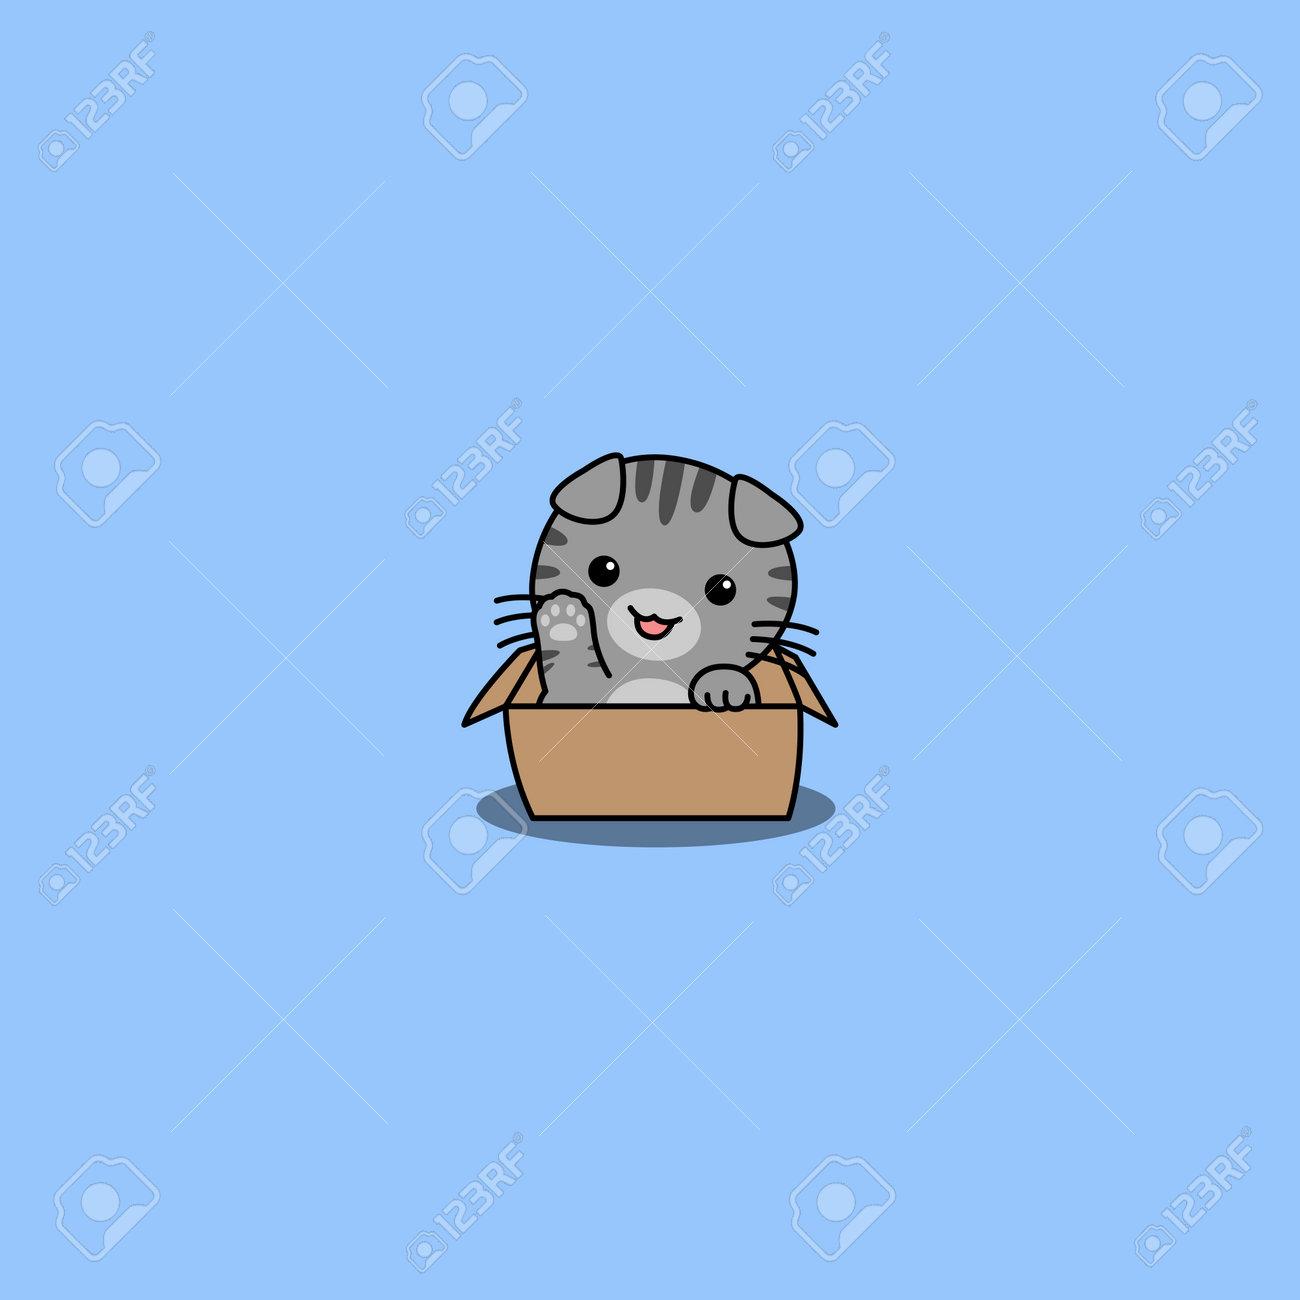 Cute scottish fold cat waving paw in the box cartoon, vector illustration - 169153200